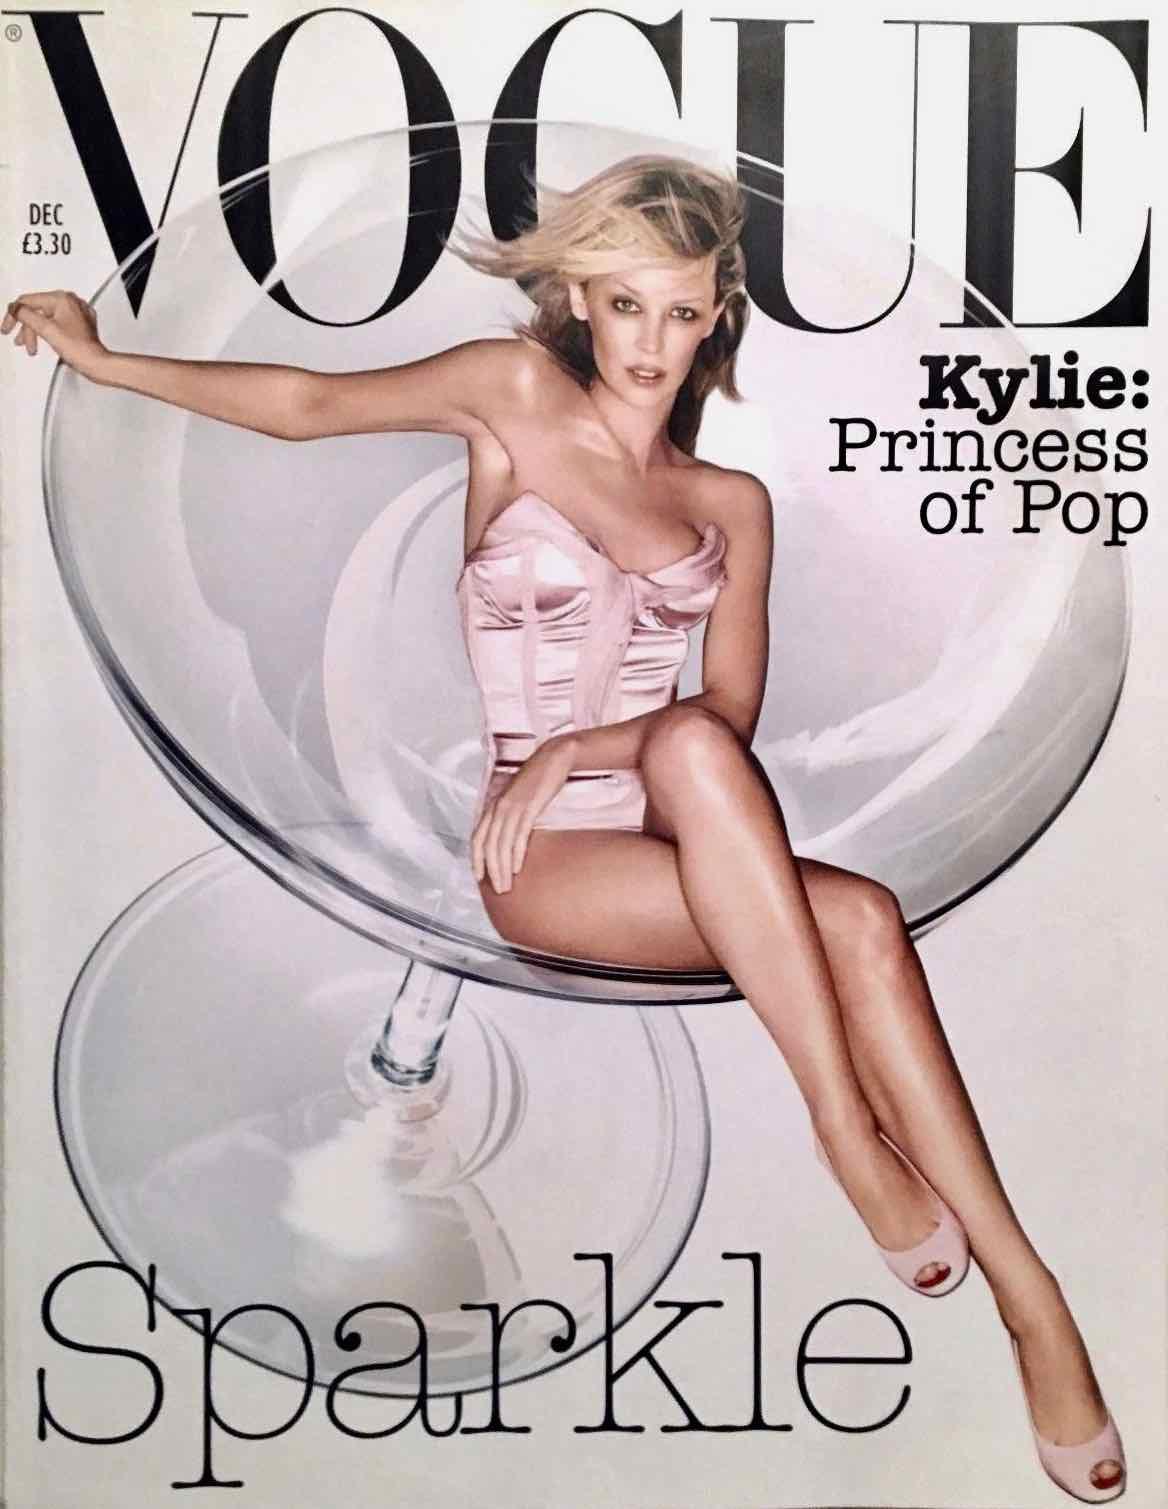 kylie-minogue-champagne-glass-vogue_2003-december